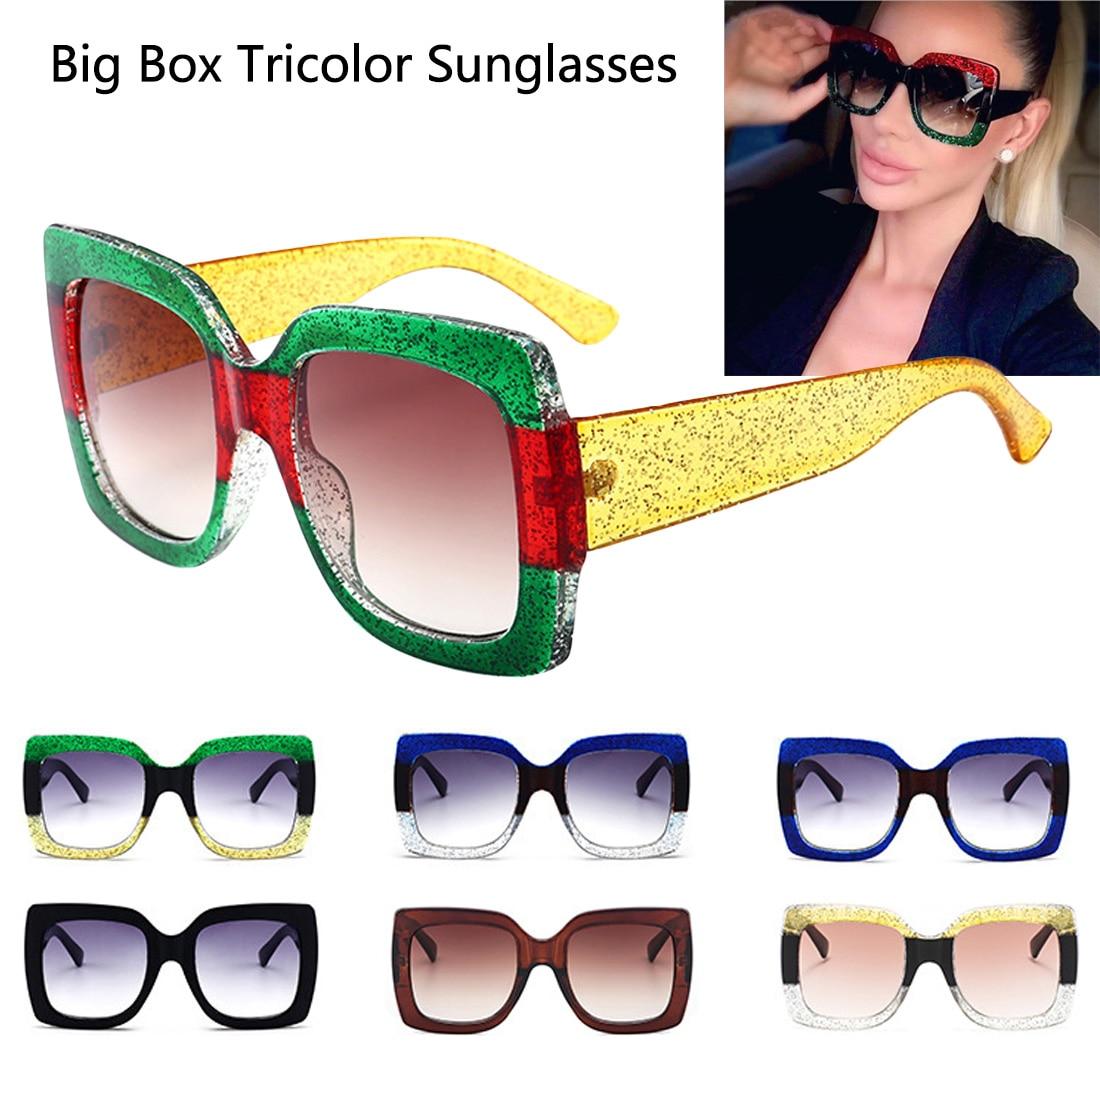 Sunglasses Women Bee Retro Glasses Men Women Sunglasses Gafas Big Box Oversized Vintage Polygon sunglass women in Women 39 s Sunglasses from Apparel Accessories